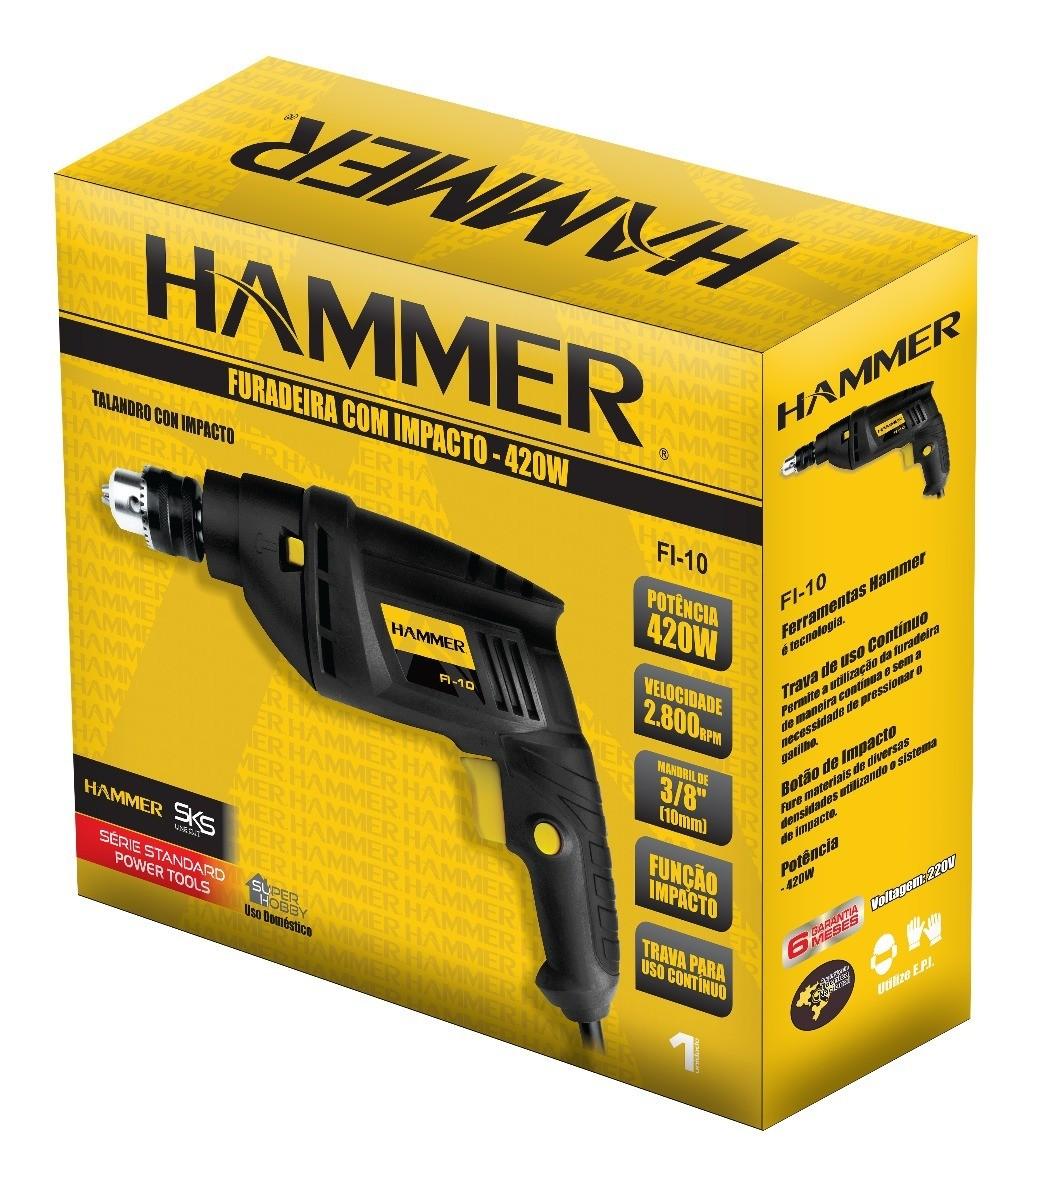 Kit Furadeira De Impacto 420w Hammer Fi-10 + Tico Tico 400w Hammer St-400 + Lixadeira Orbital Hammer Lo-135 1/3 De Lixa